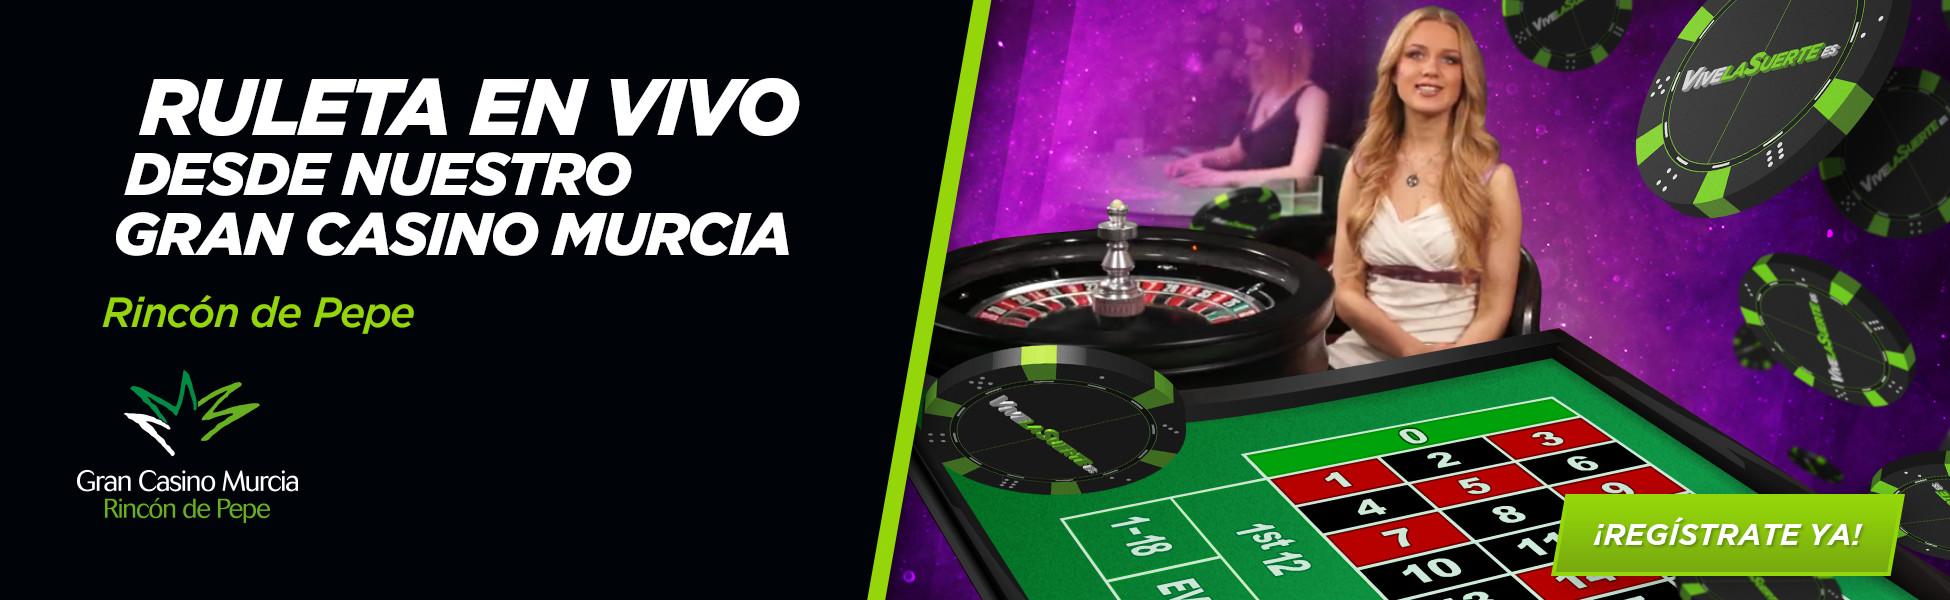 200% de tu primer depósito en el casino Vivelasuerte-762